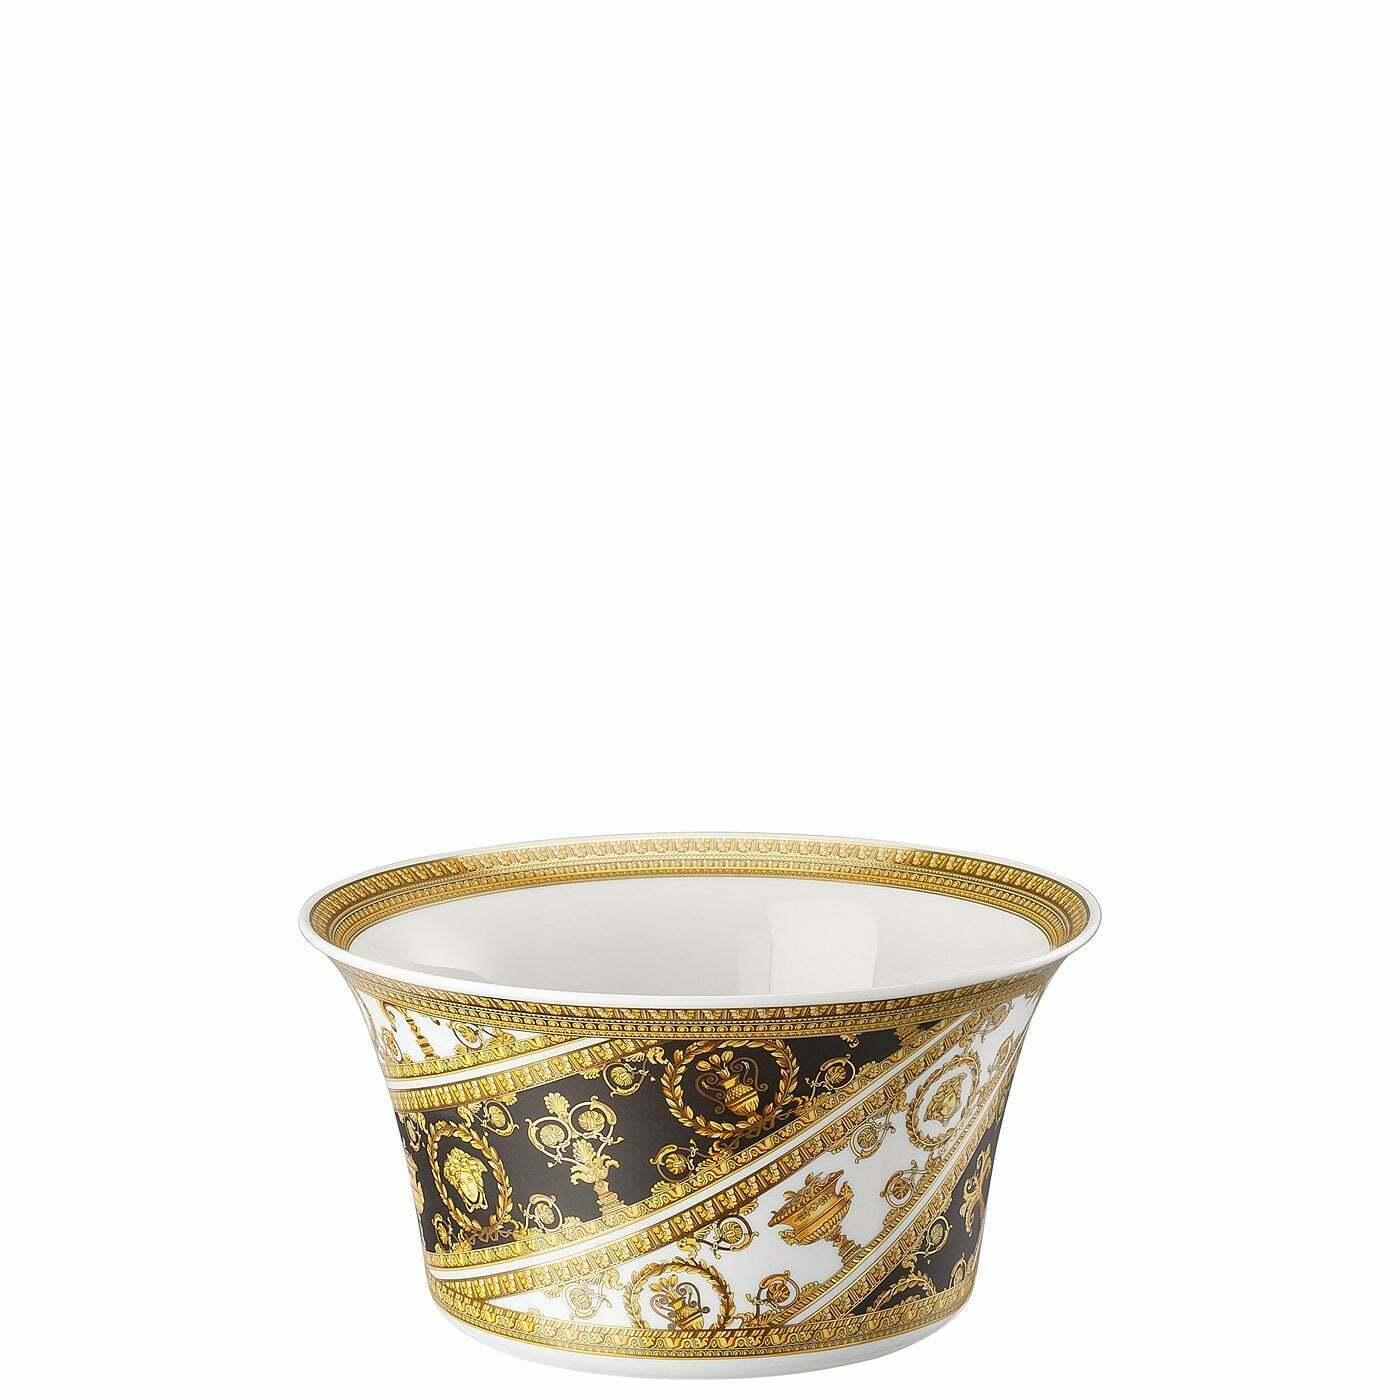 "Versace by Rosenthal I Love Baroque Salad Bowl 2 20.0 cm/7.87"" - $298.85"